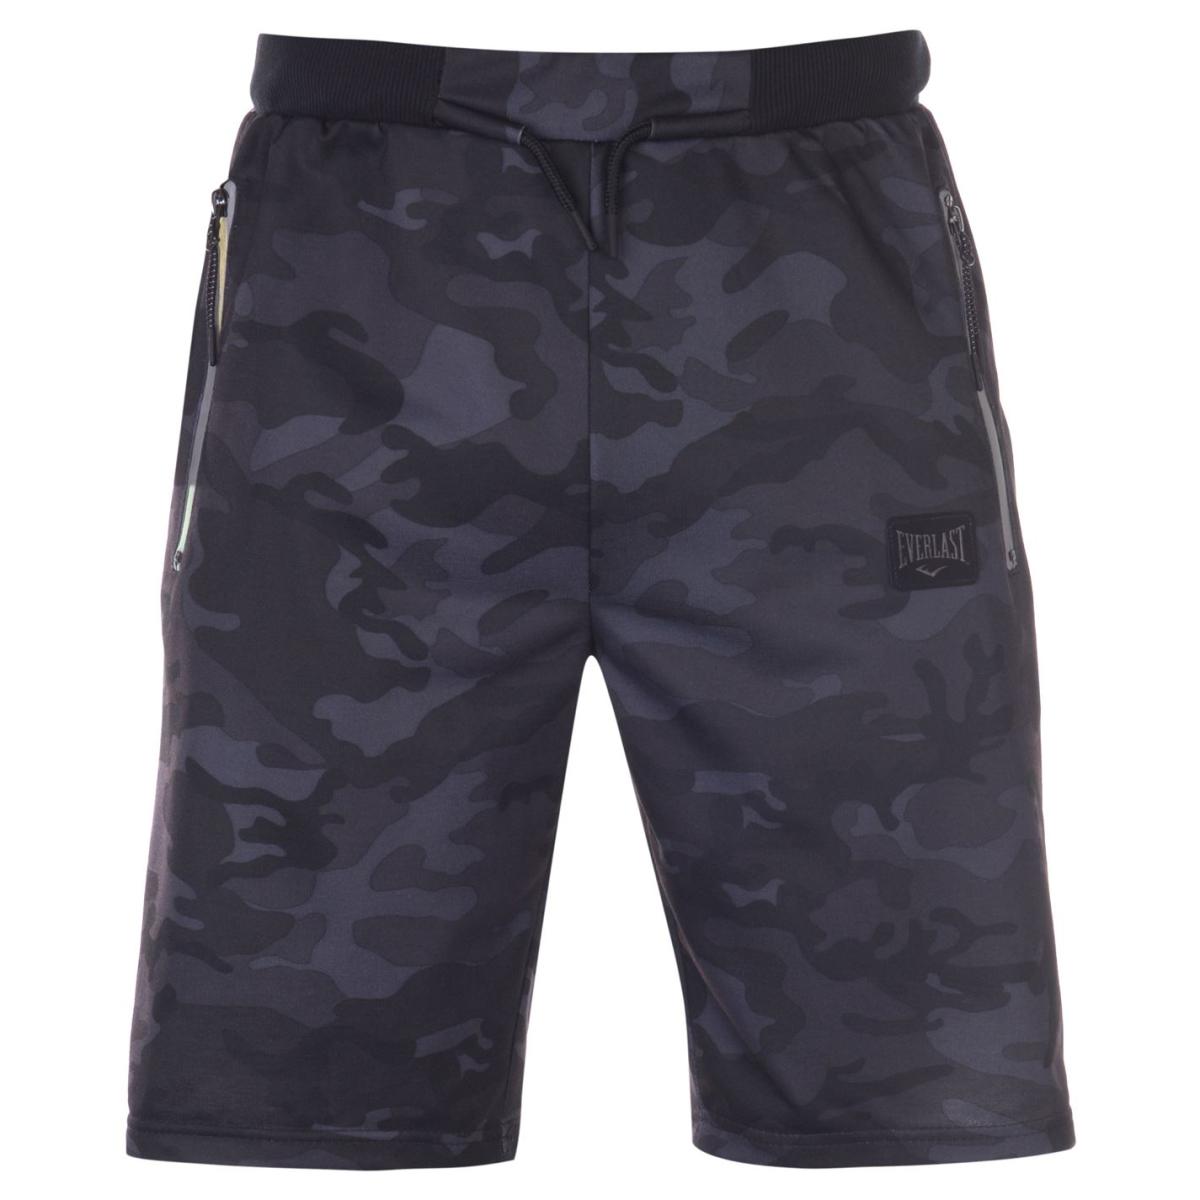 EVERLAST-Uomo-Shorts-Pantaloni-Sportivi-Corti-Bermuda-Pantaloni-Pantaloni-sportivi-6015-Premier miniatura 2